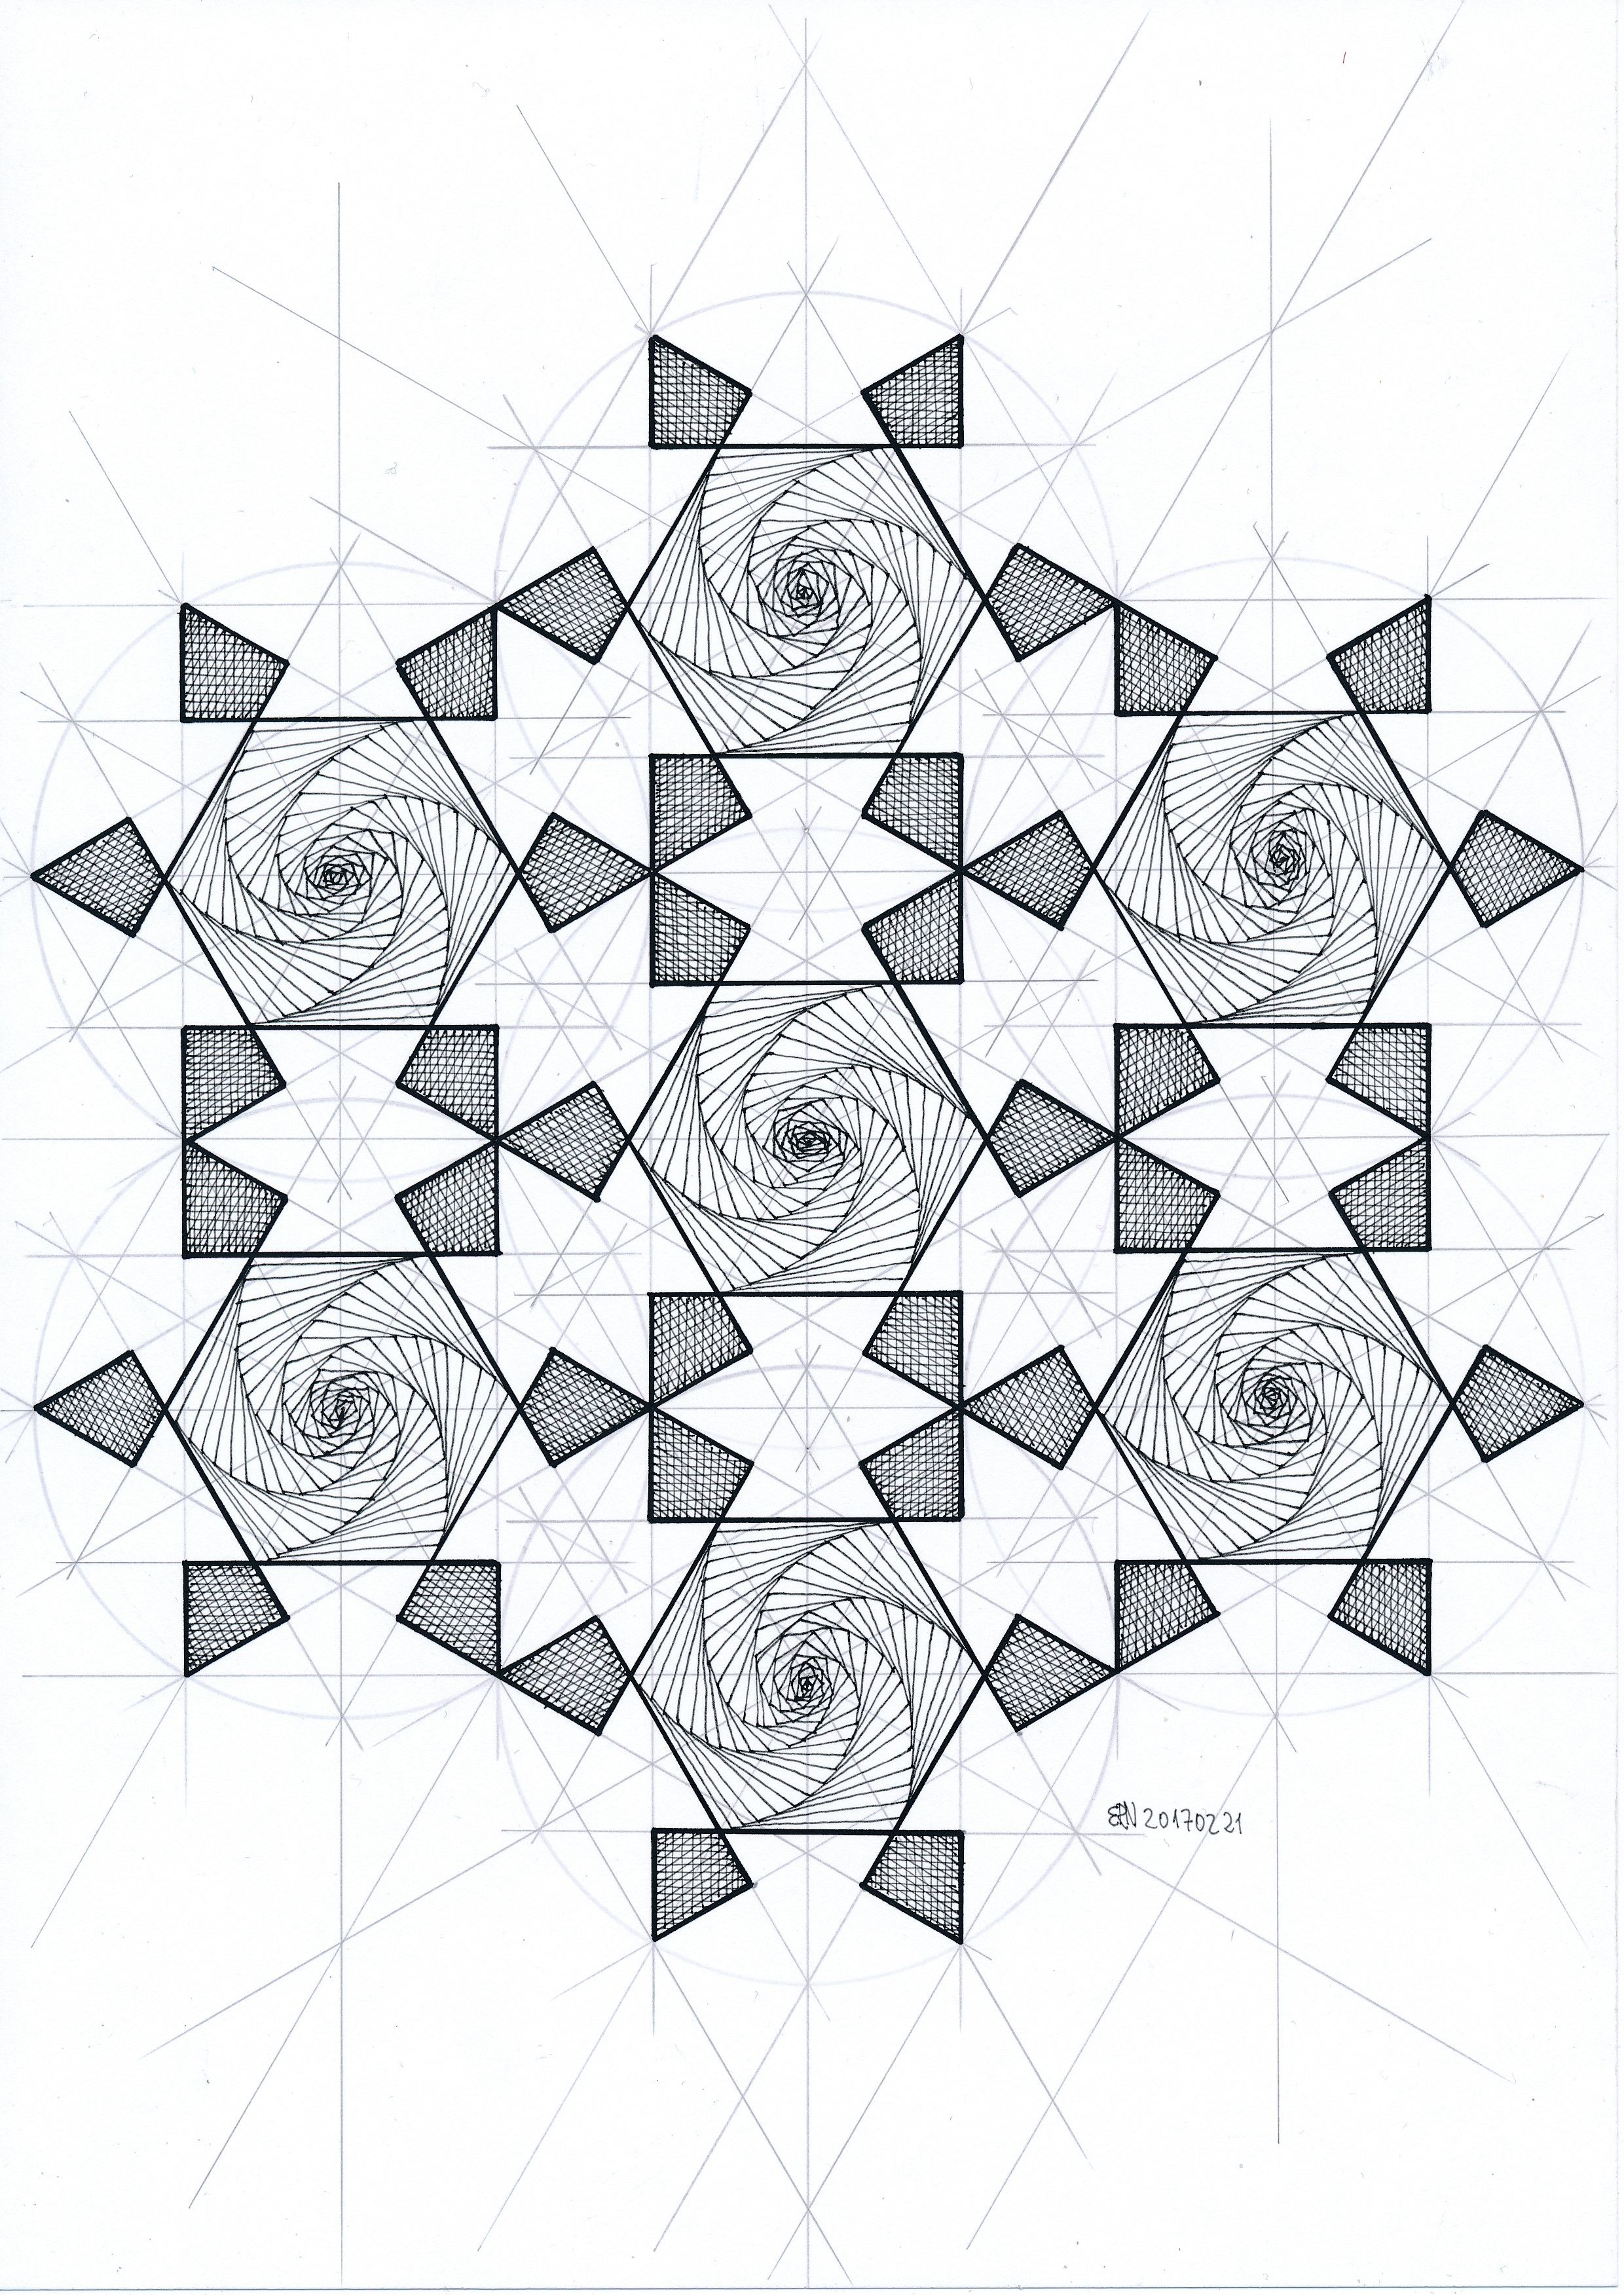 Islamicdesign Islamicart Islamicgeometry Arabiangeometry Symmetry Geometry Pattern Mathart Regolo54 Escher Patronen Grafisch